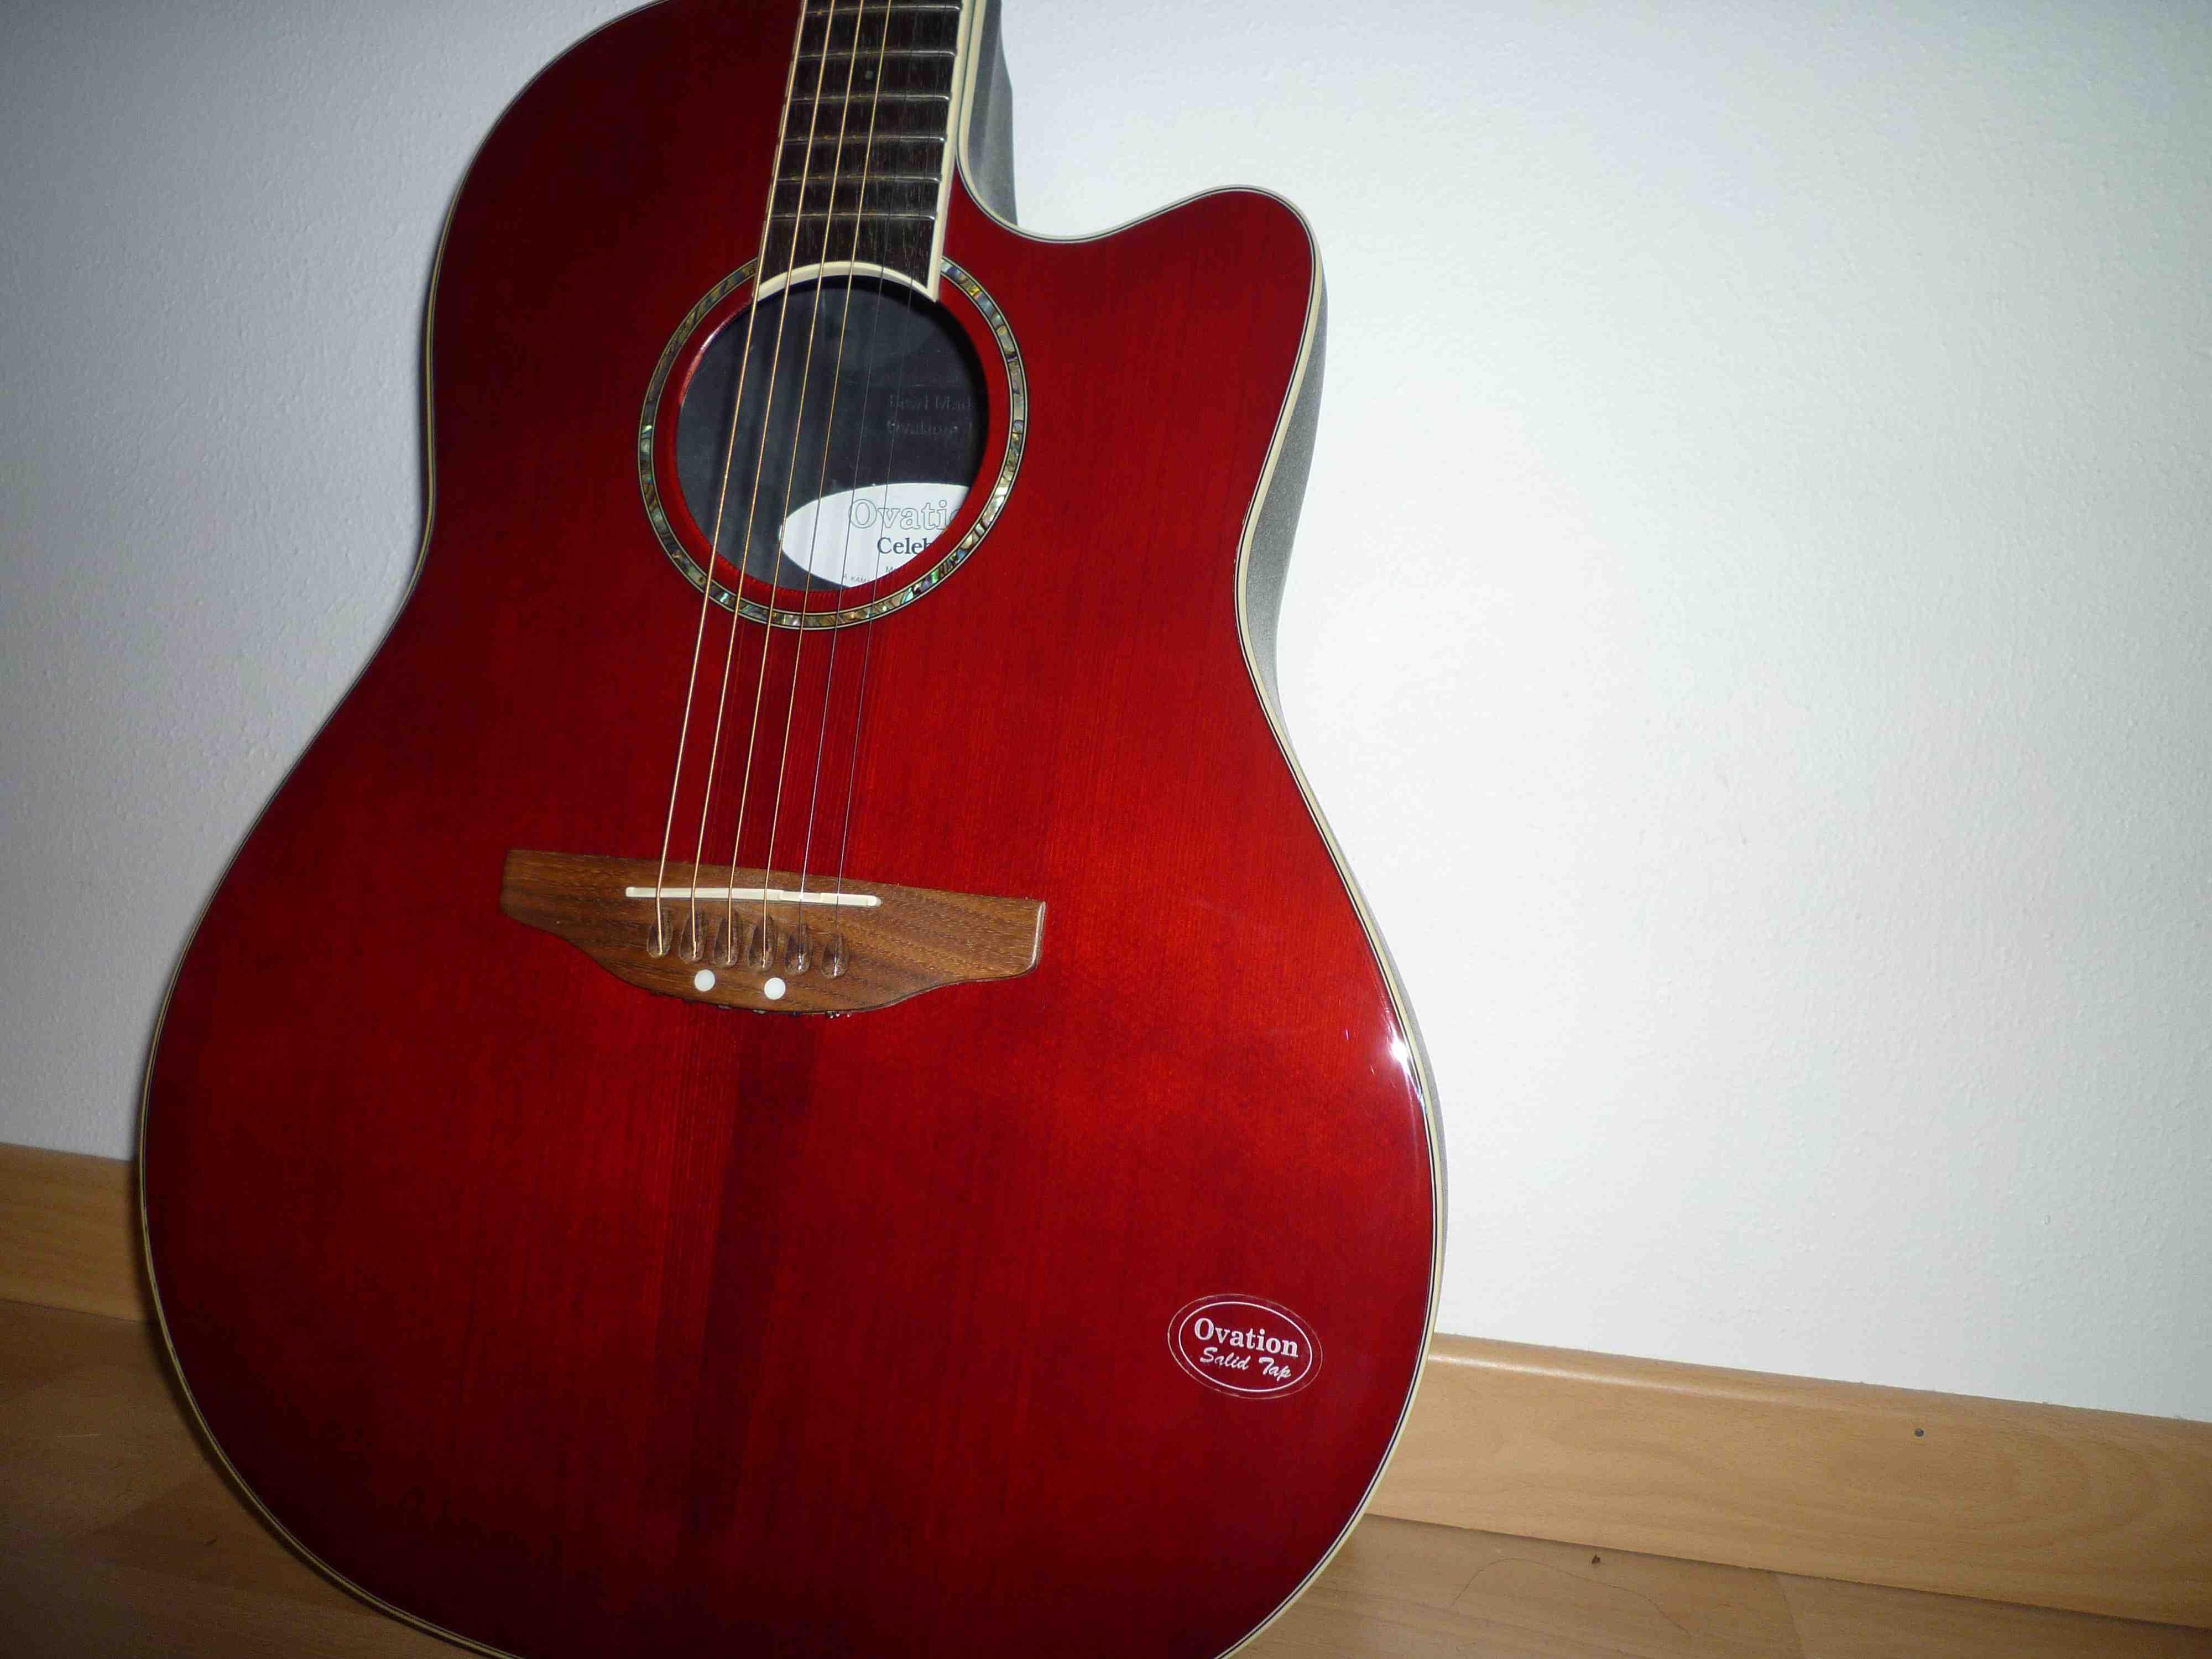 Ovation Celebrity CC24S Acoustic-Electric Guitar | Guitar ...